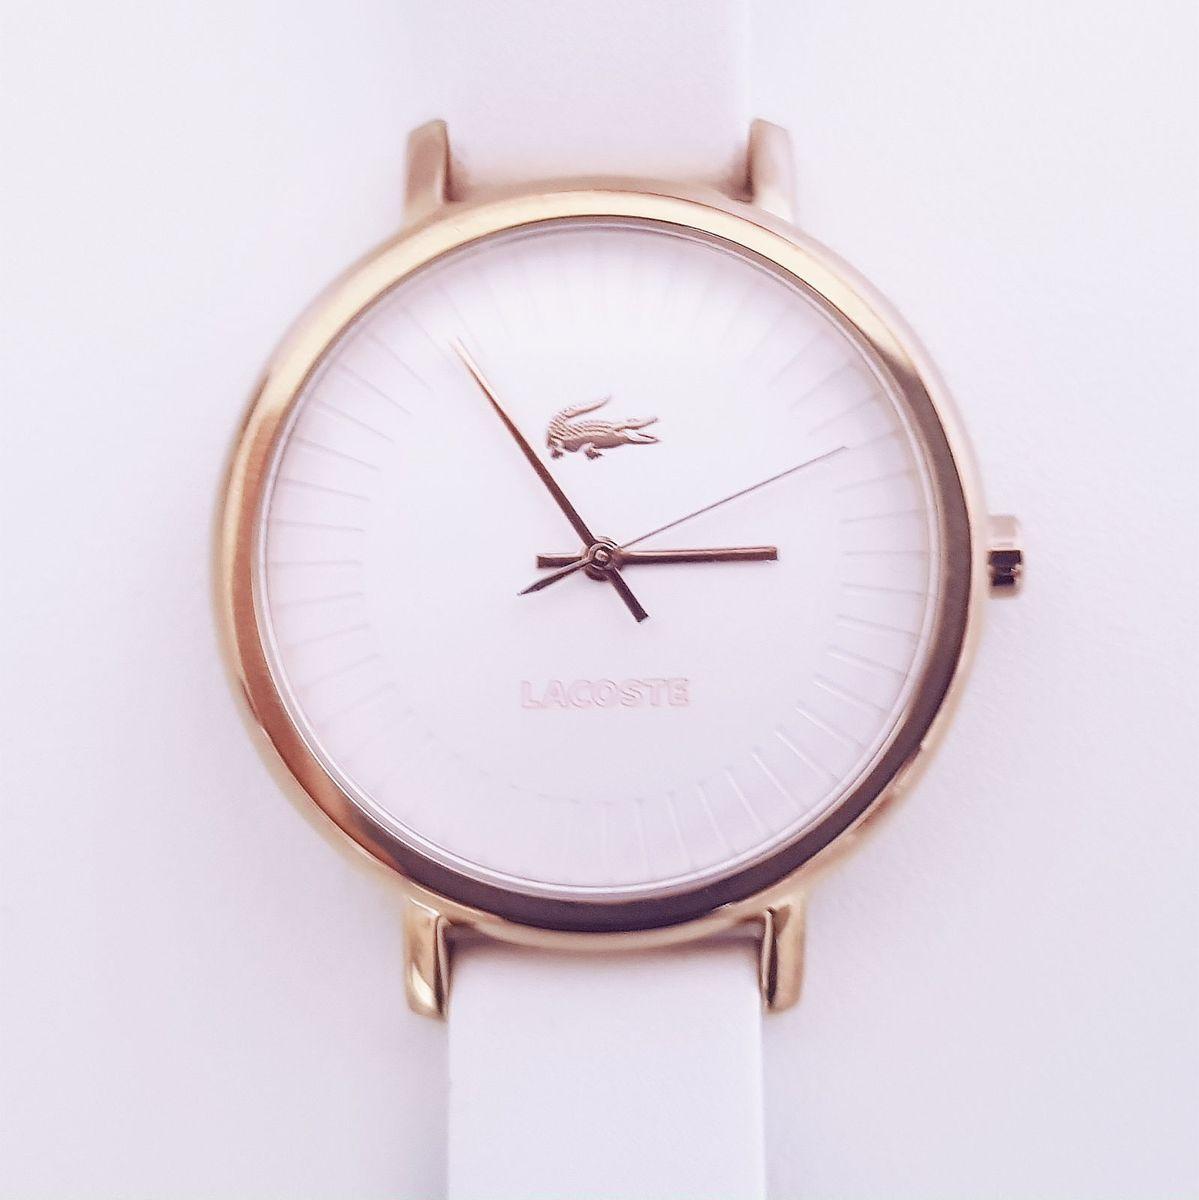 680c482cdc0 relógio lacoste rose gold 2000715 ouro rosa couro branco - relógios lacoste